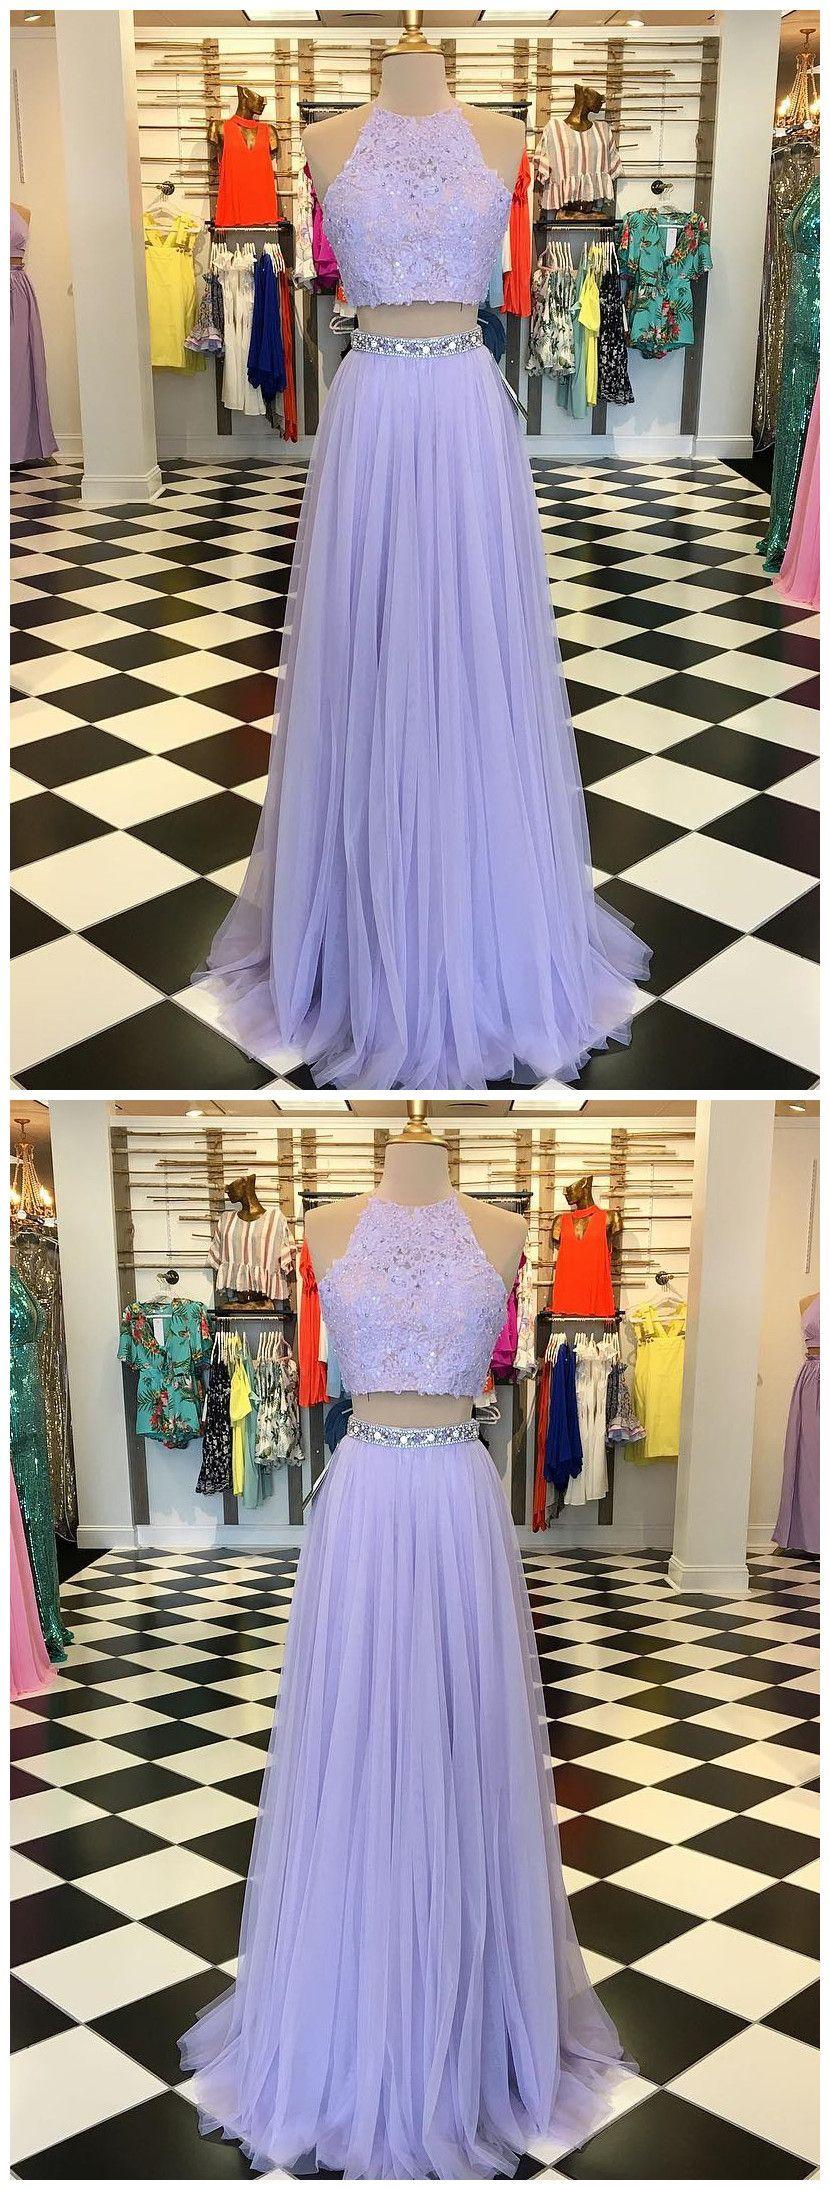 Two Pieces A Line Scoop Prom Dress Floor Length Lilac Prom Dresses Evening Dress Amy1620 Evening Dresses Prom Lilac Prom Dresses Two Piece Evening Dresses [ 2190 x 830 Pixel ]